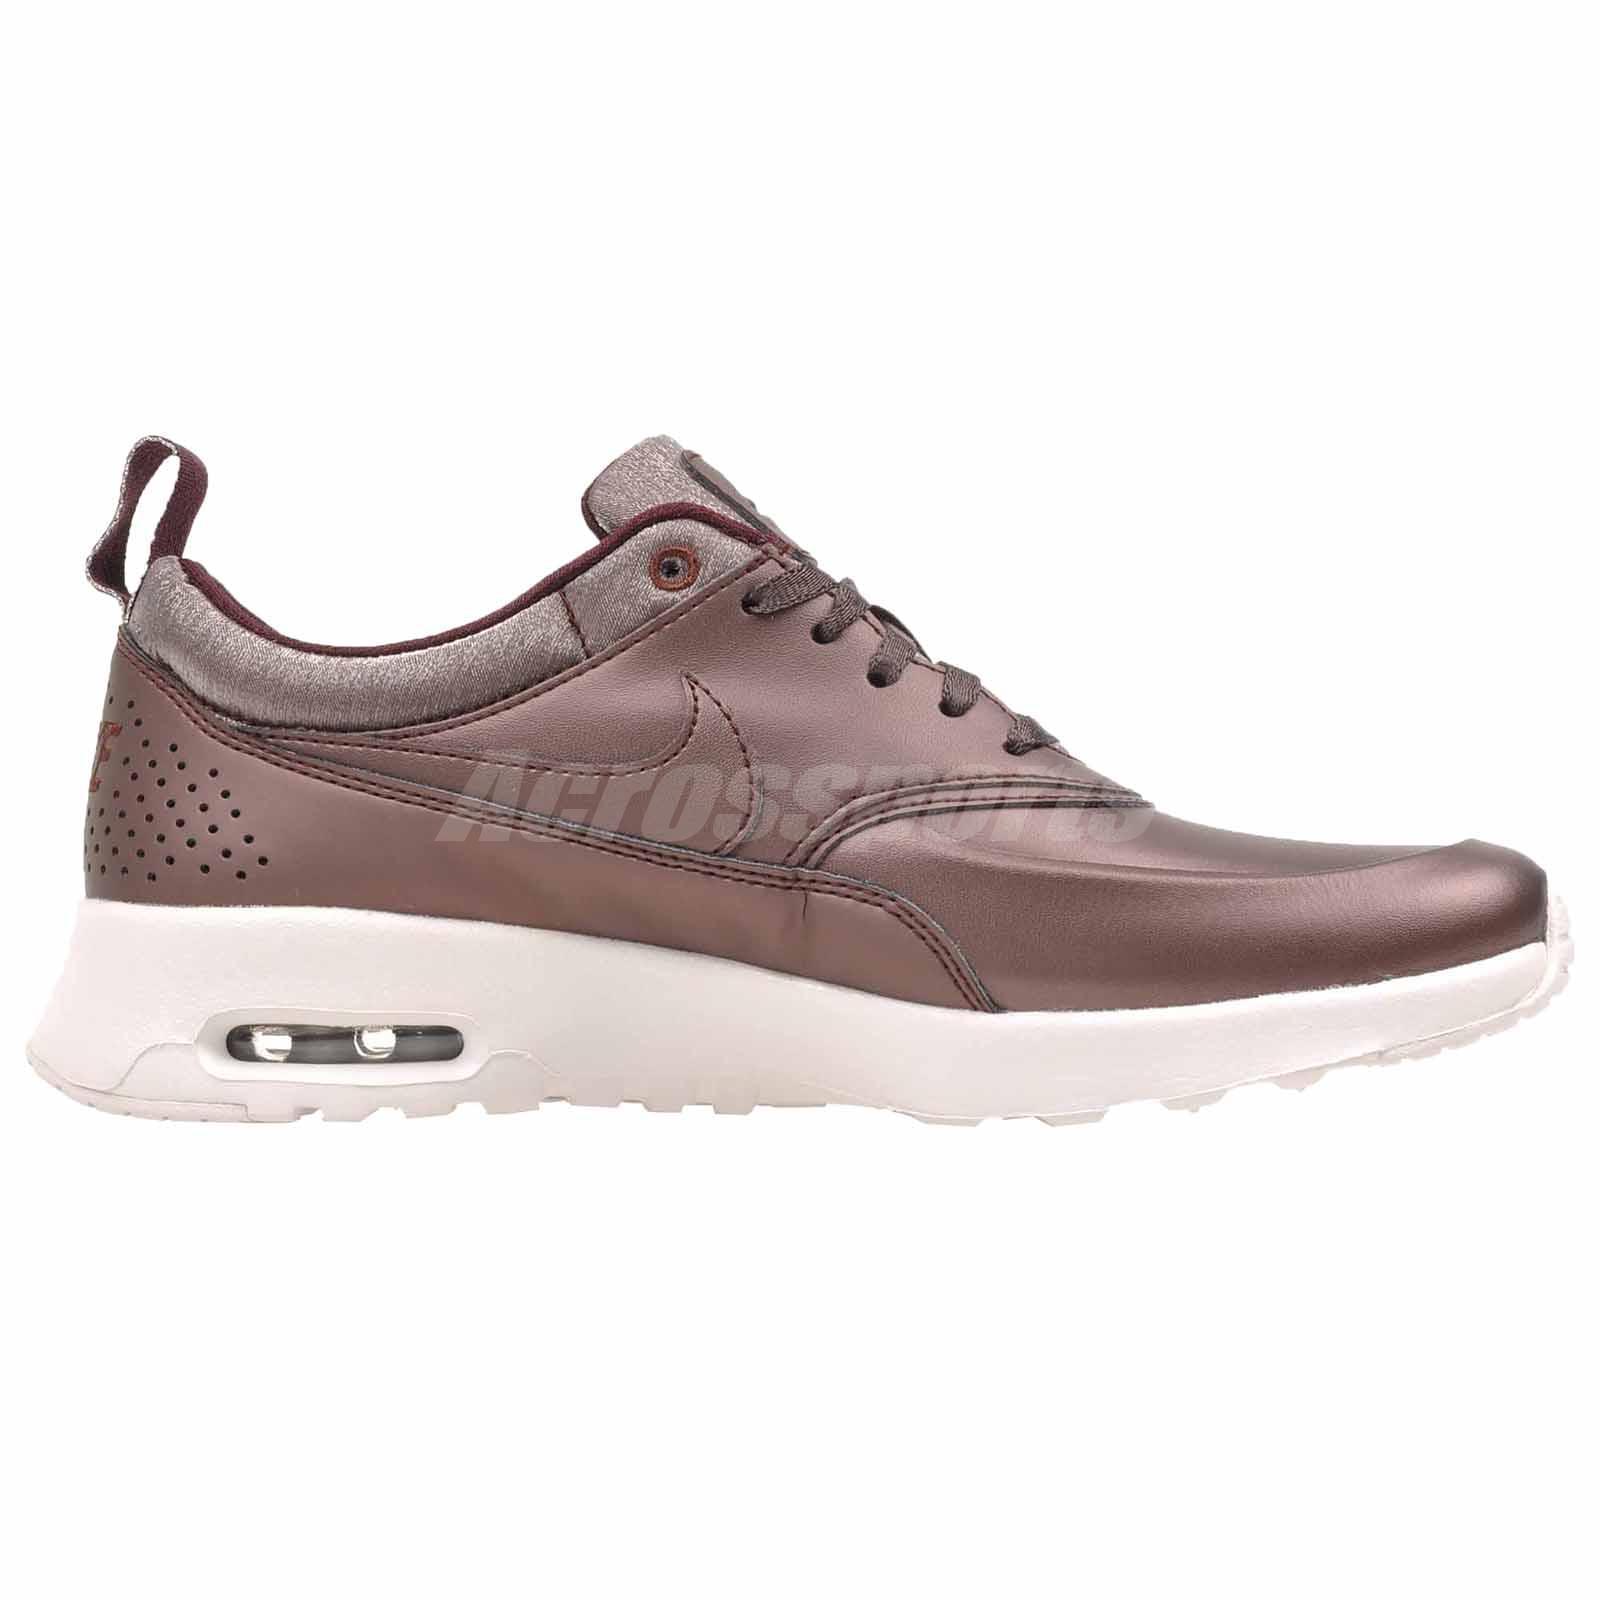 Nike Air Max Thea Prm Womens 616723-900 Metallic Mahogany Running Shoes Size 5